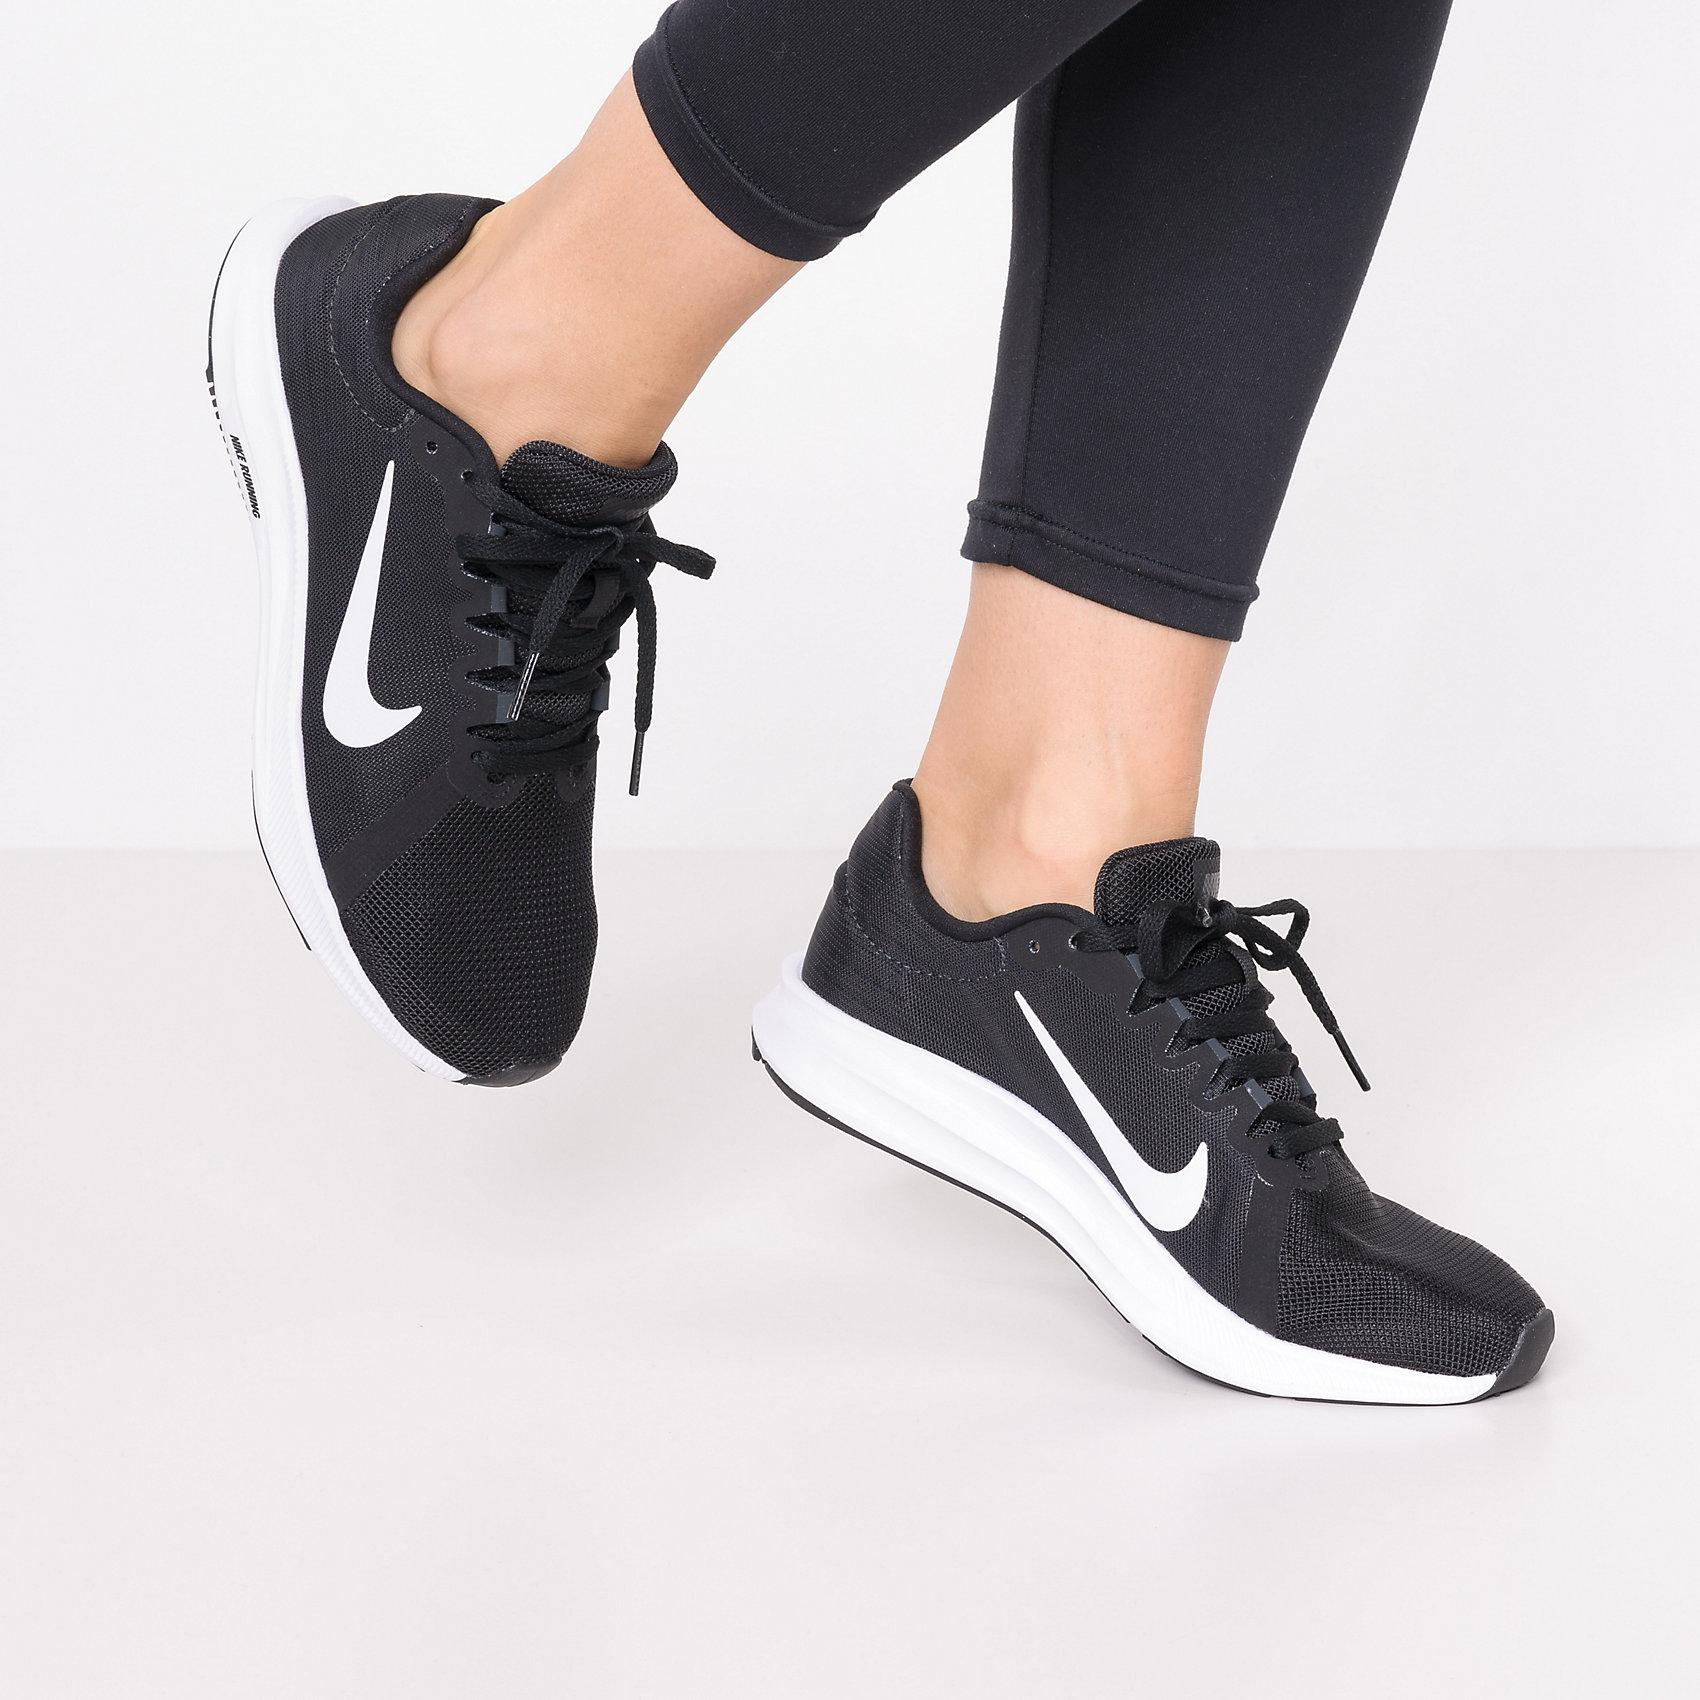 fcff43cb99fcab Neu Nike Performance Downshifter 8 Laufschuhe 7632245 für Damen